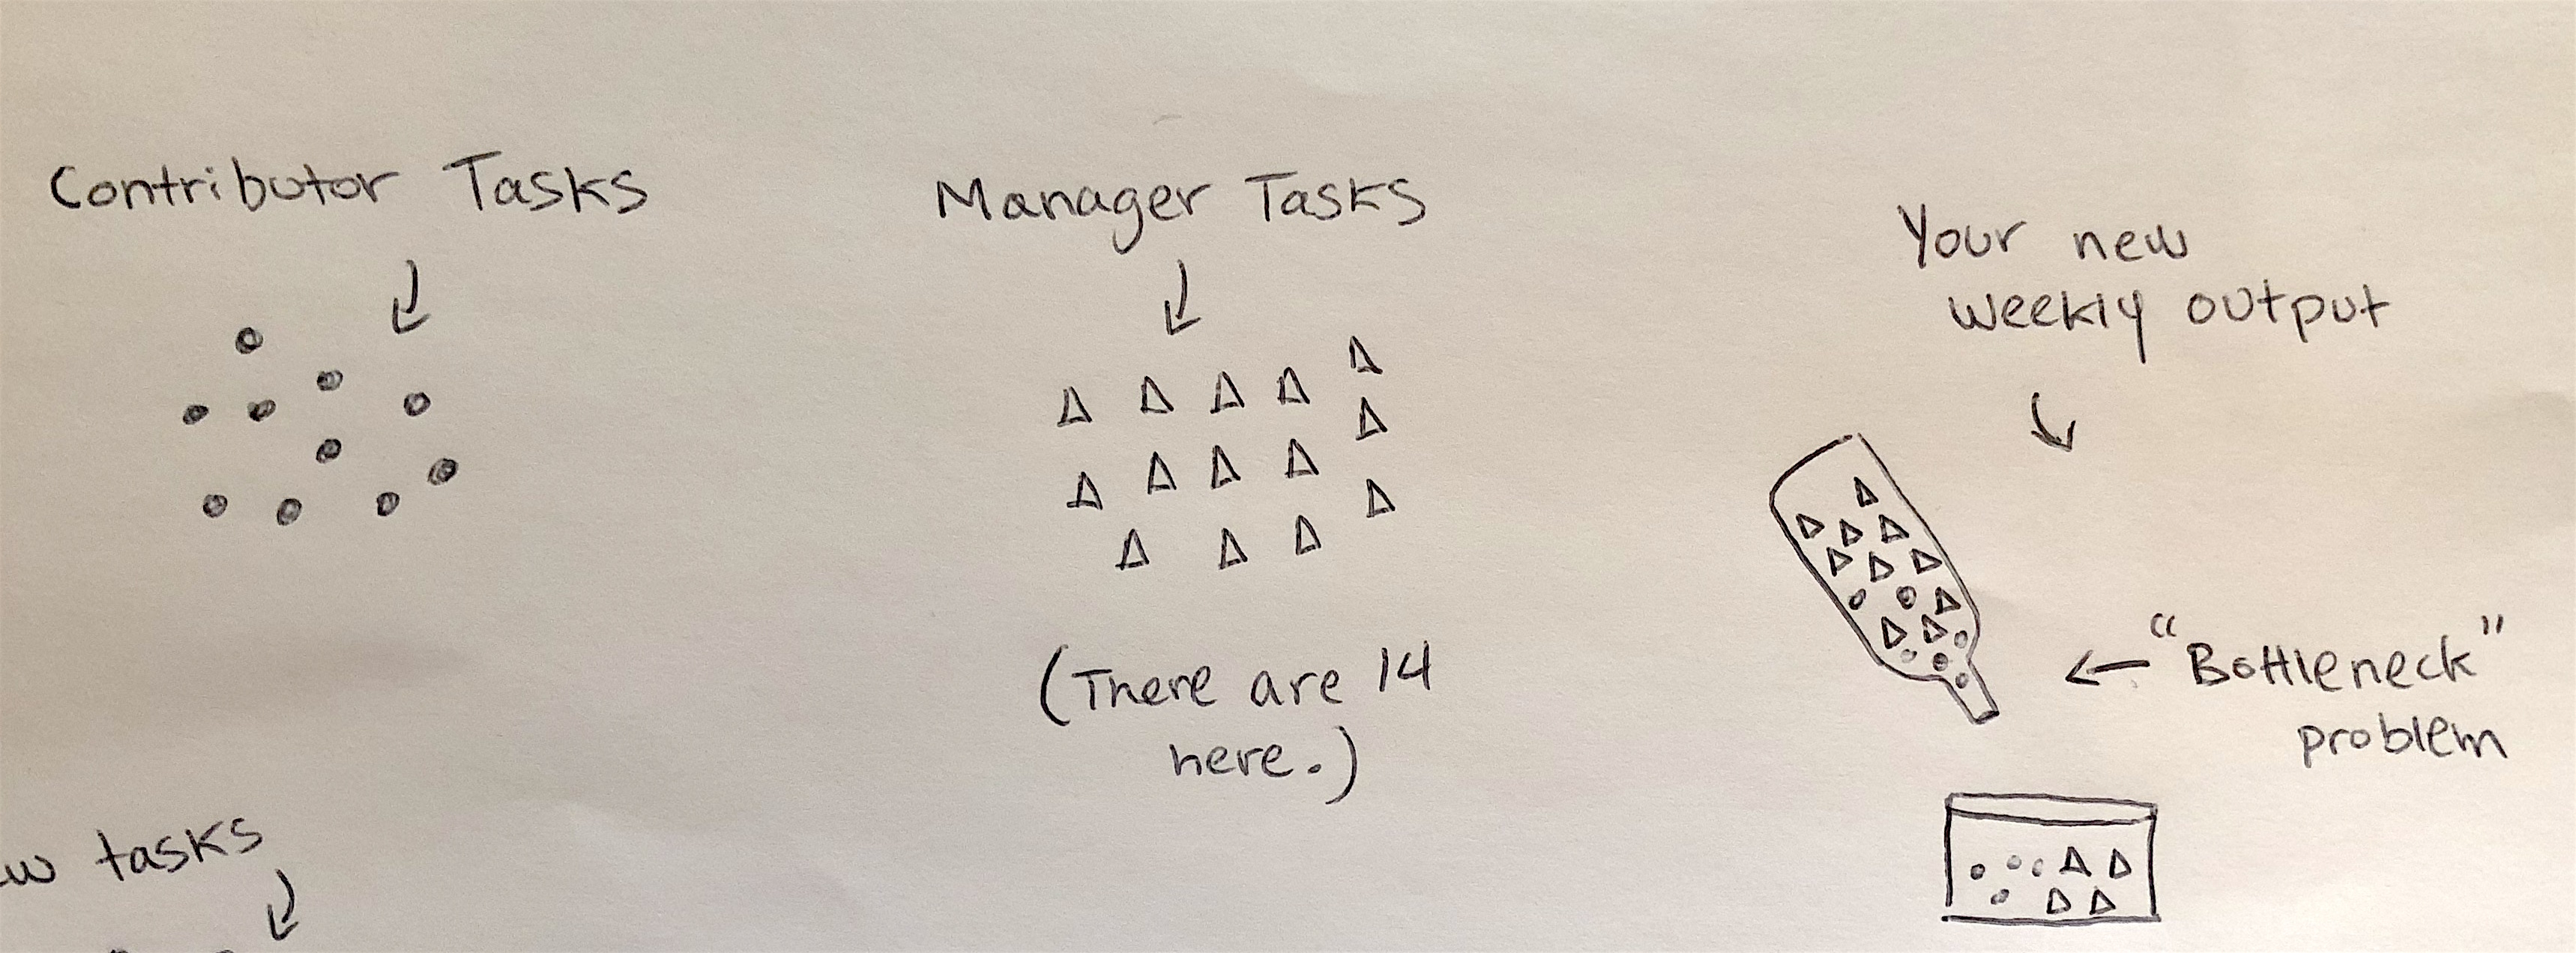 Management skills IMAGE 2